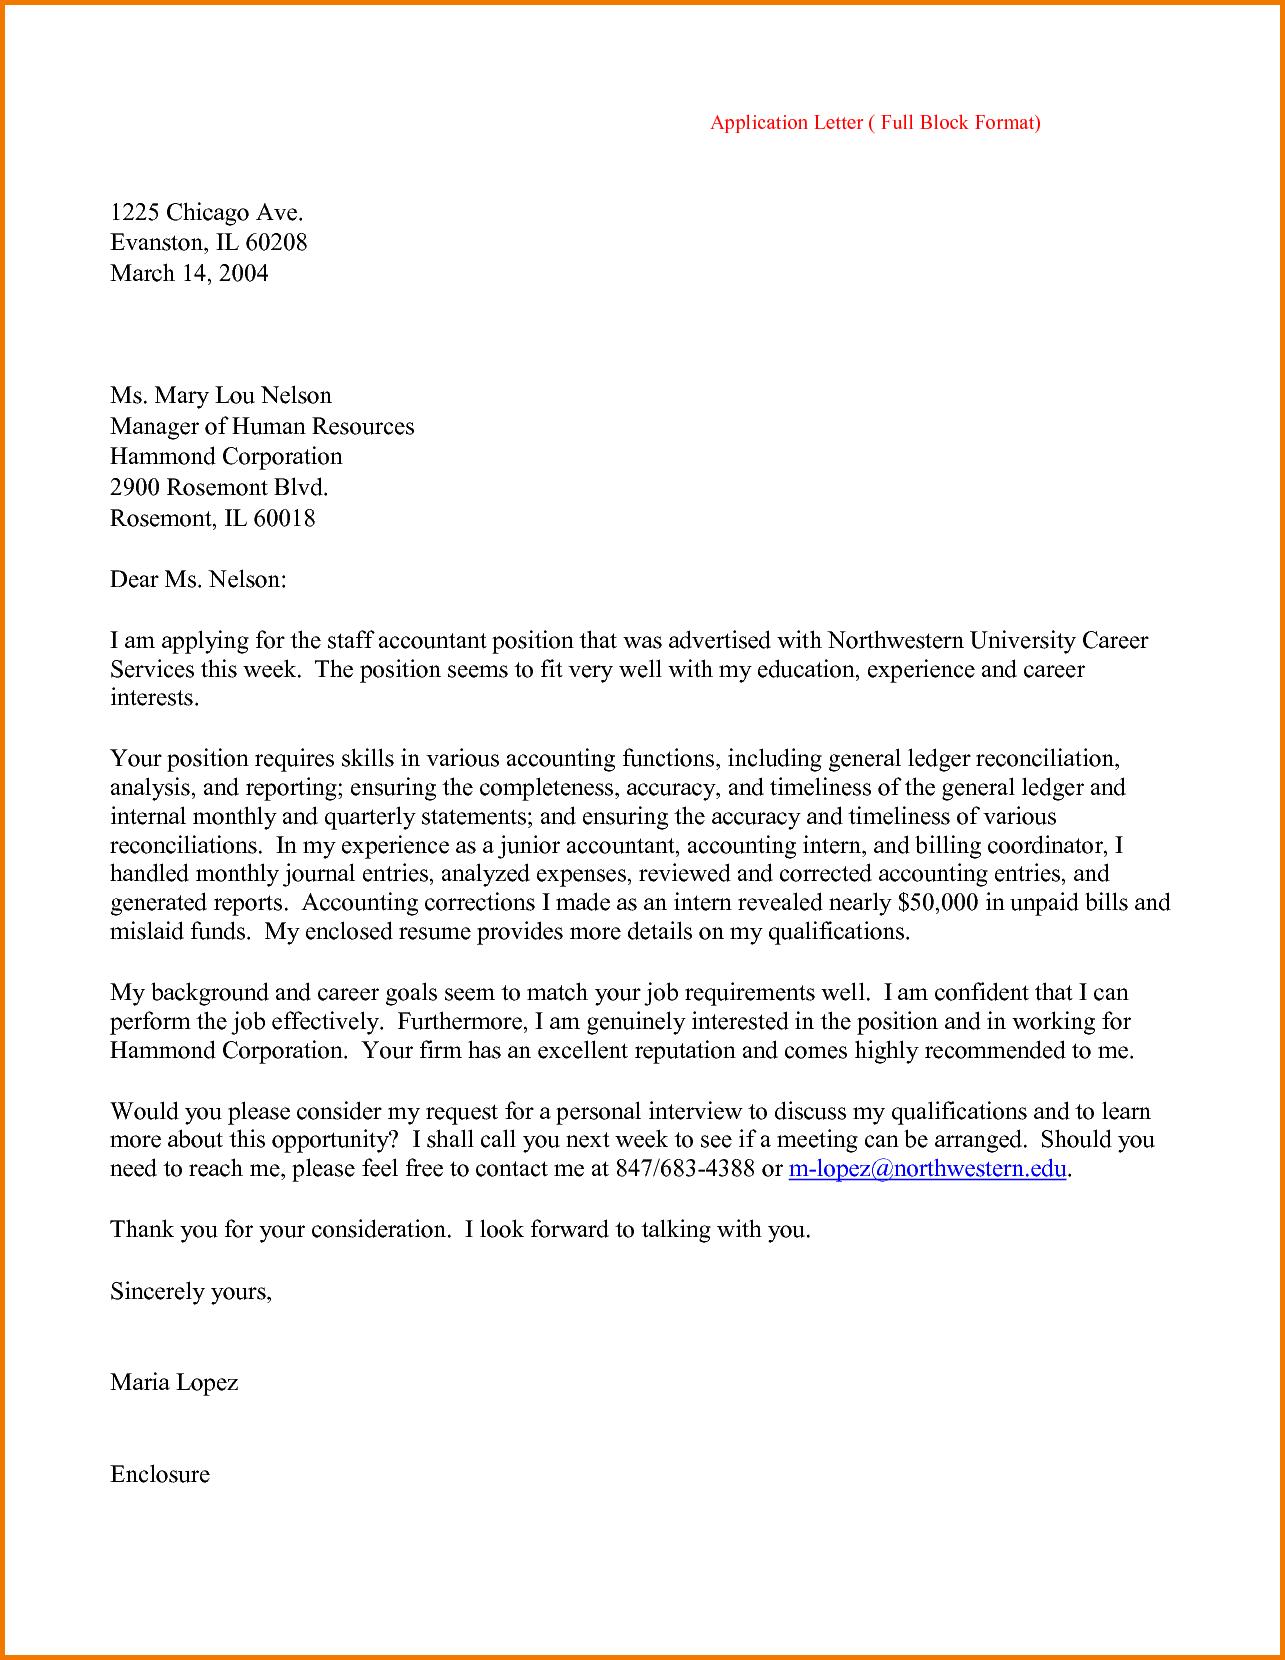 Formal Job Application Letter Format Financial Statement Form Free